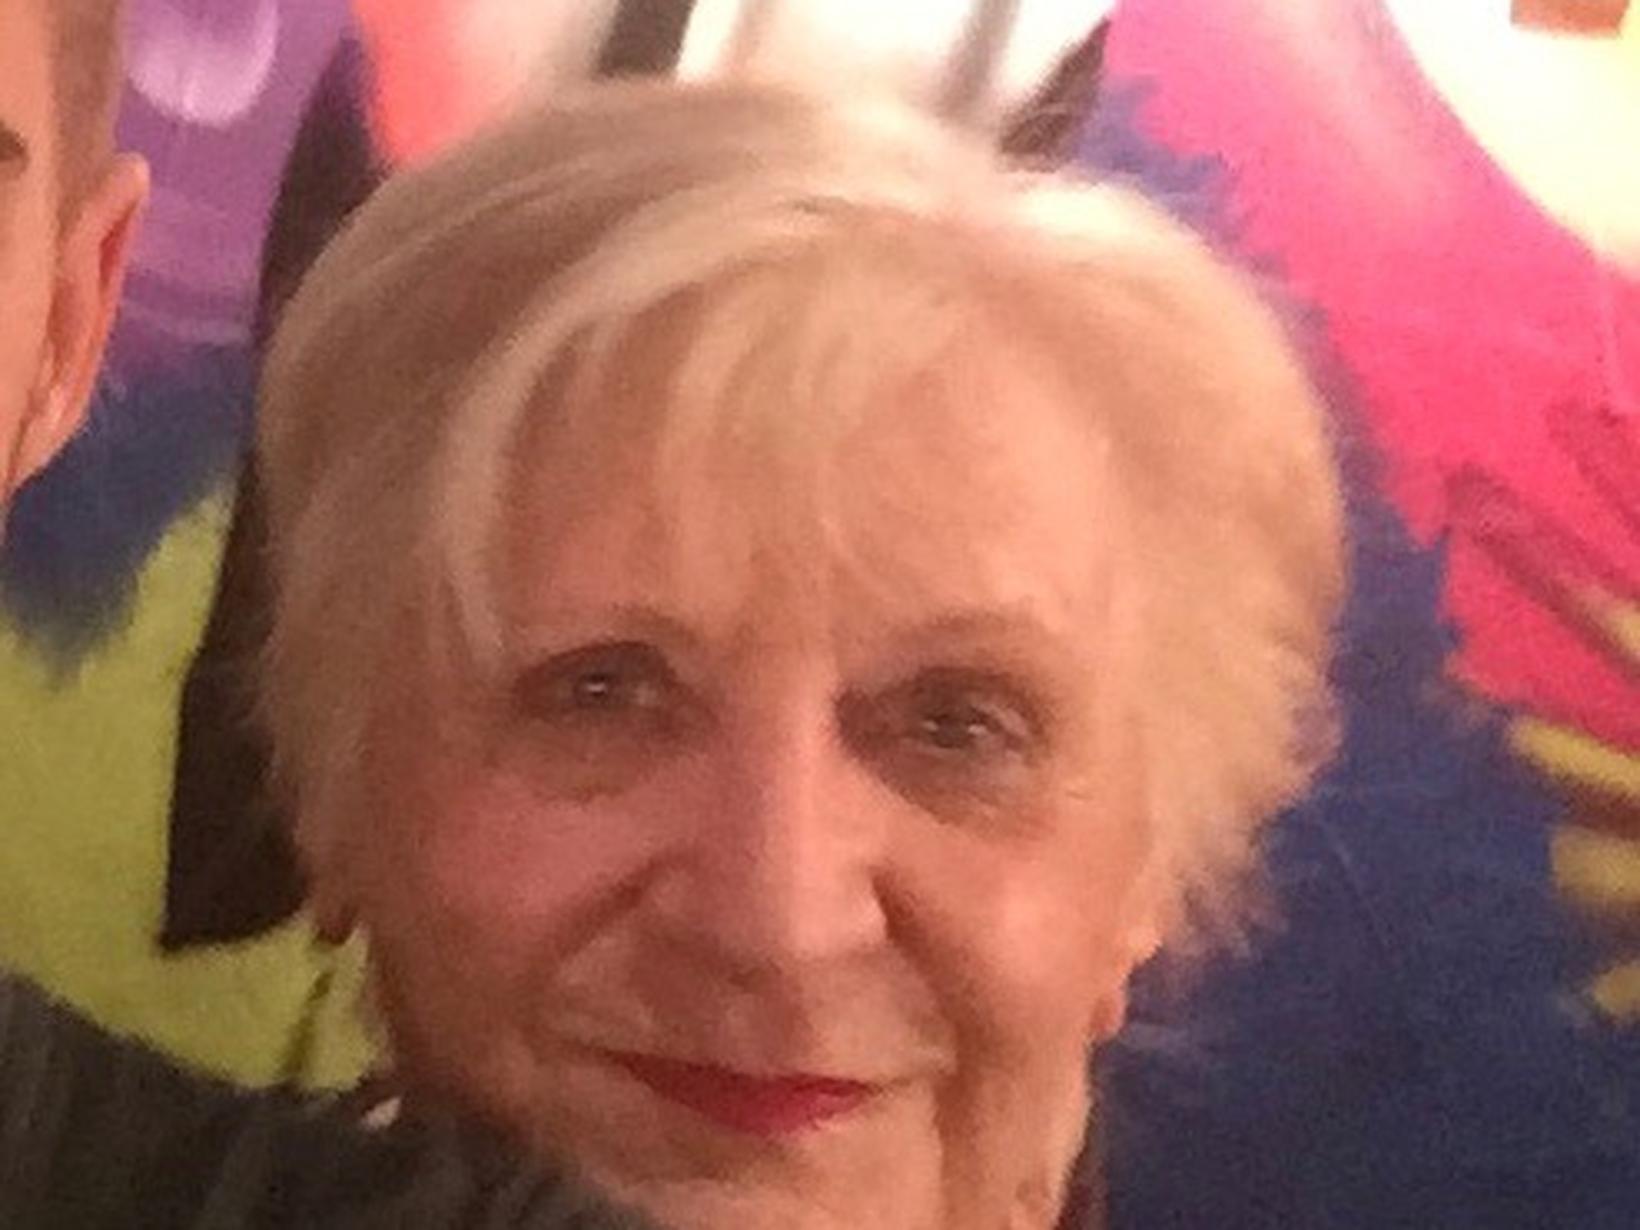 Margaret from Macedon, Victoria, Australia